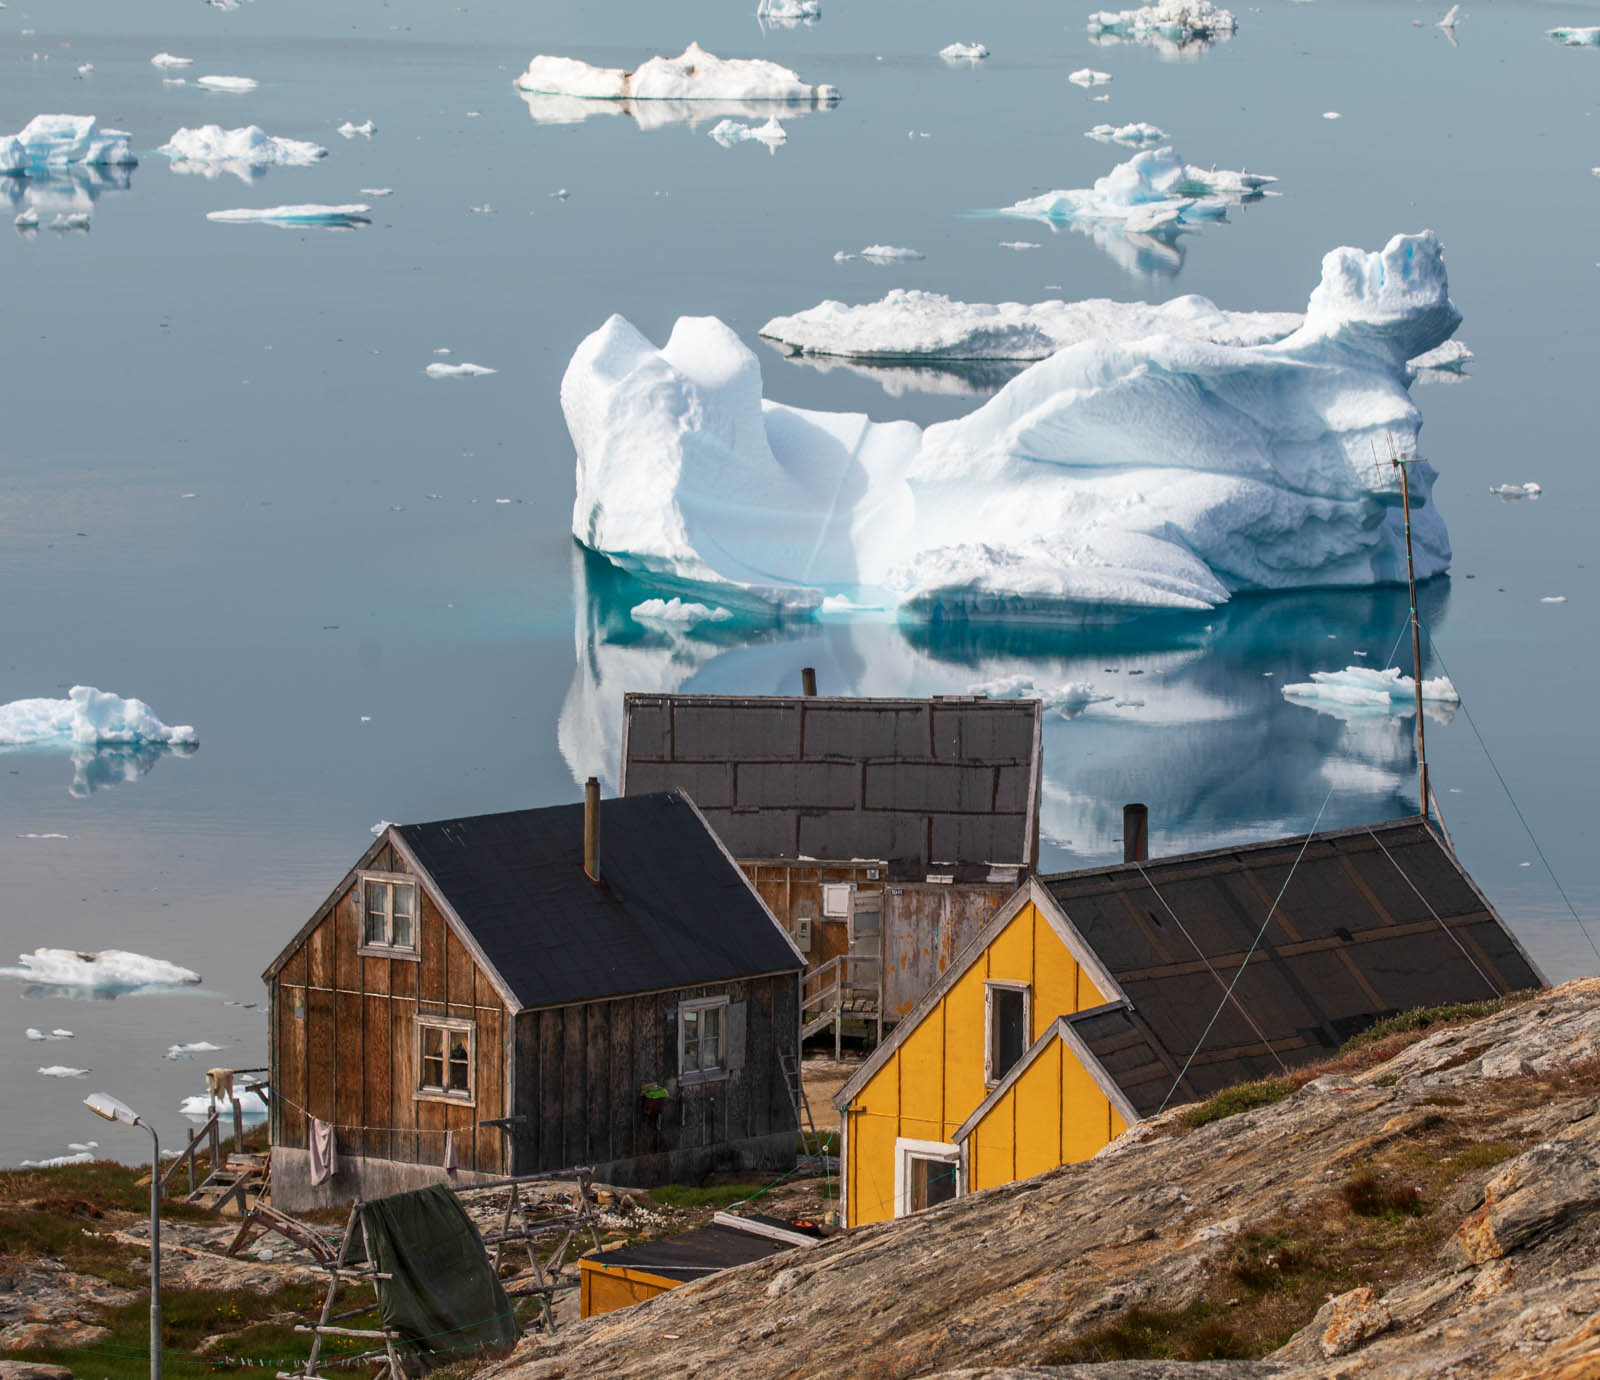 Photo: Haus am Fjord